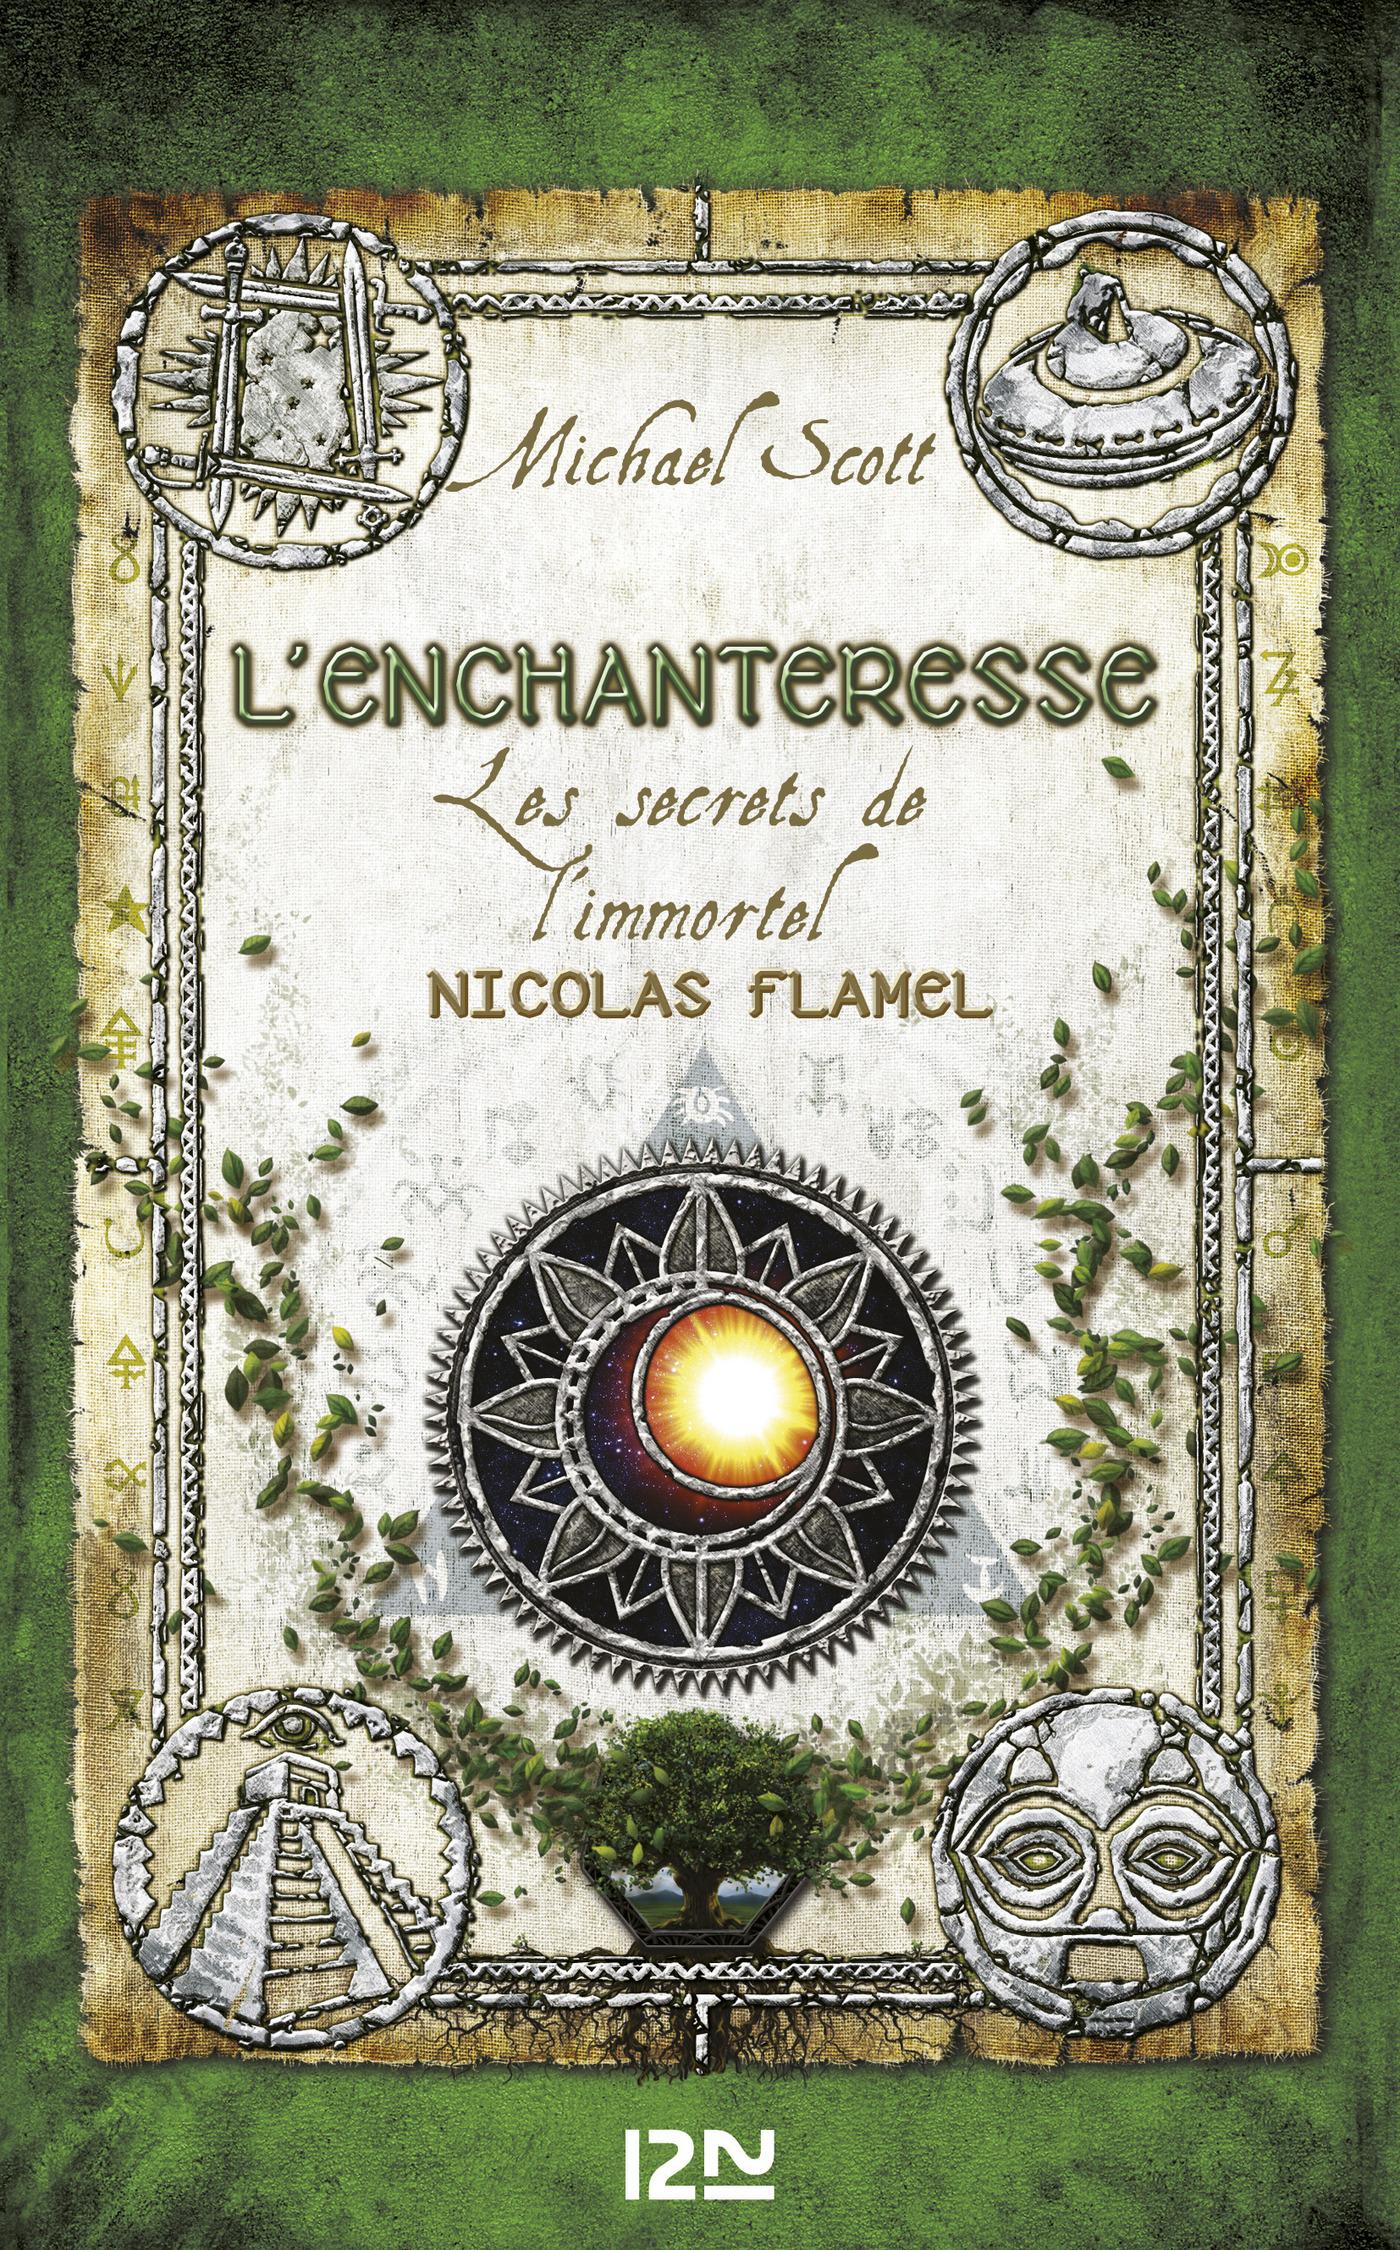 Les secrets de l'immortel Nicolas Flamel tome 6, L'ENCHANTERESSE